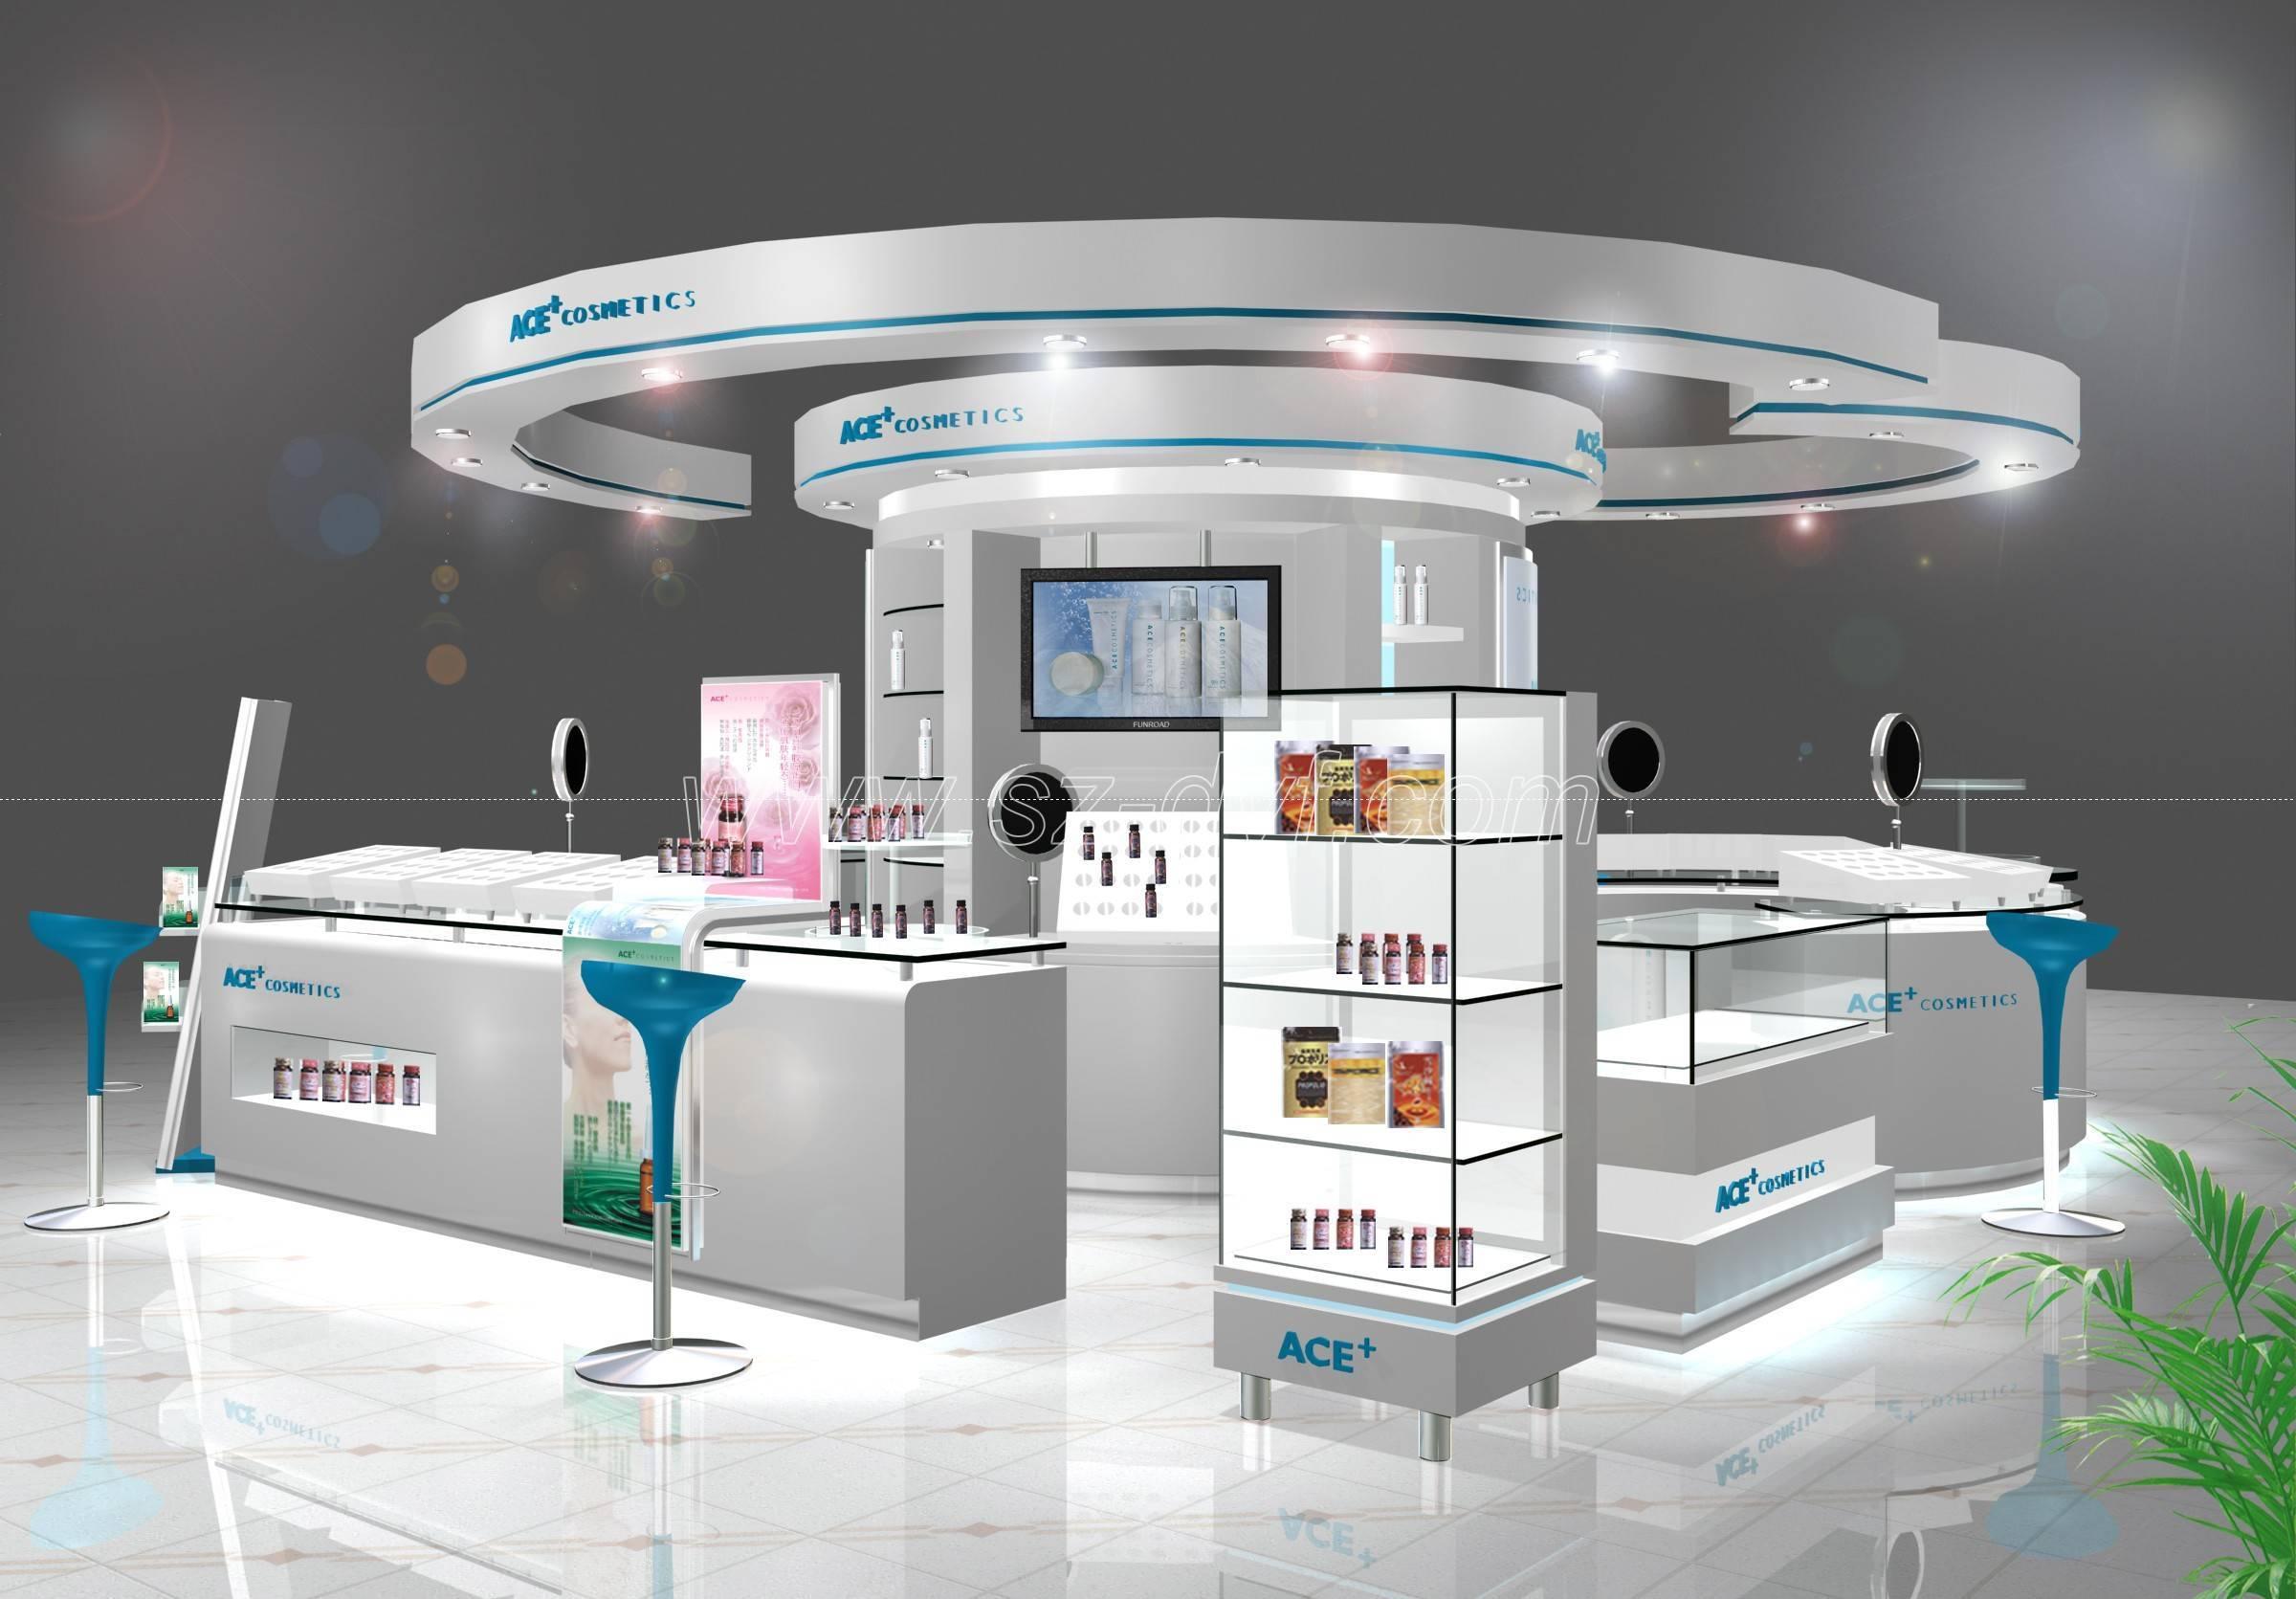 Exhibition Display Stands : Cosmetics display showcase kiosk stand shenzhen